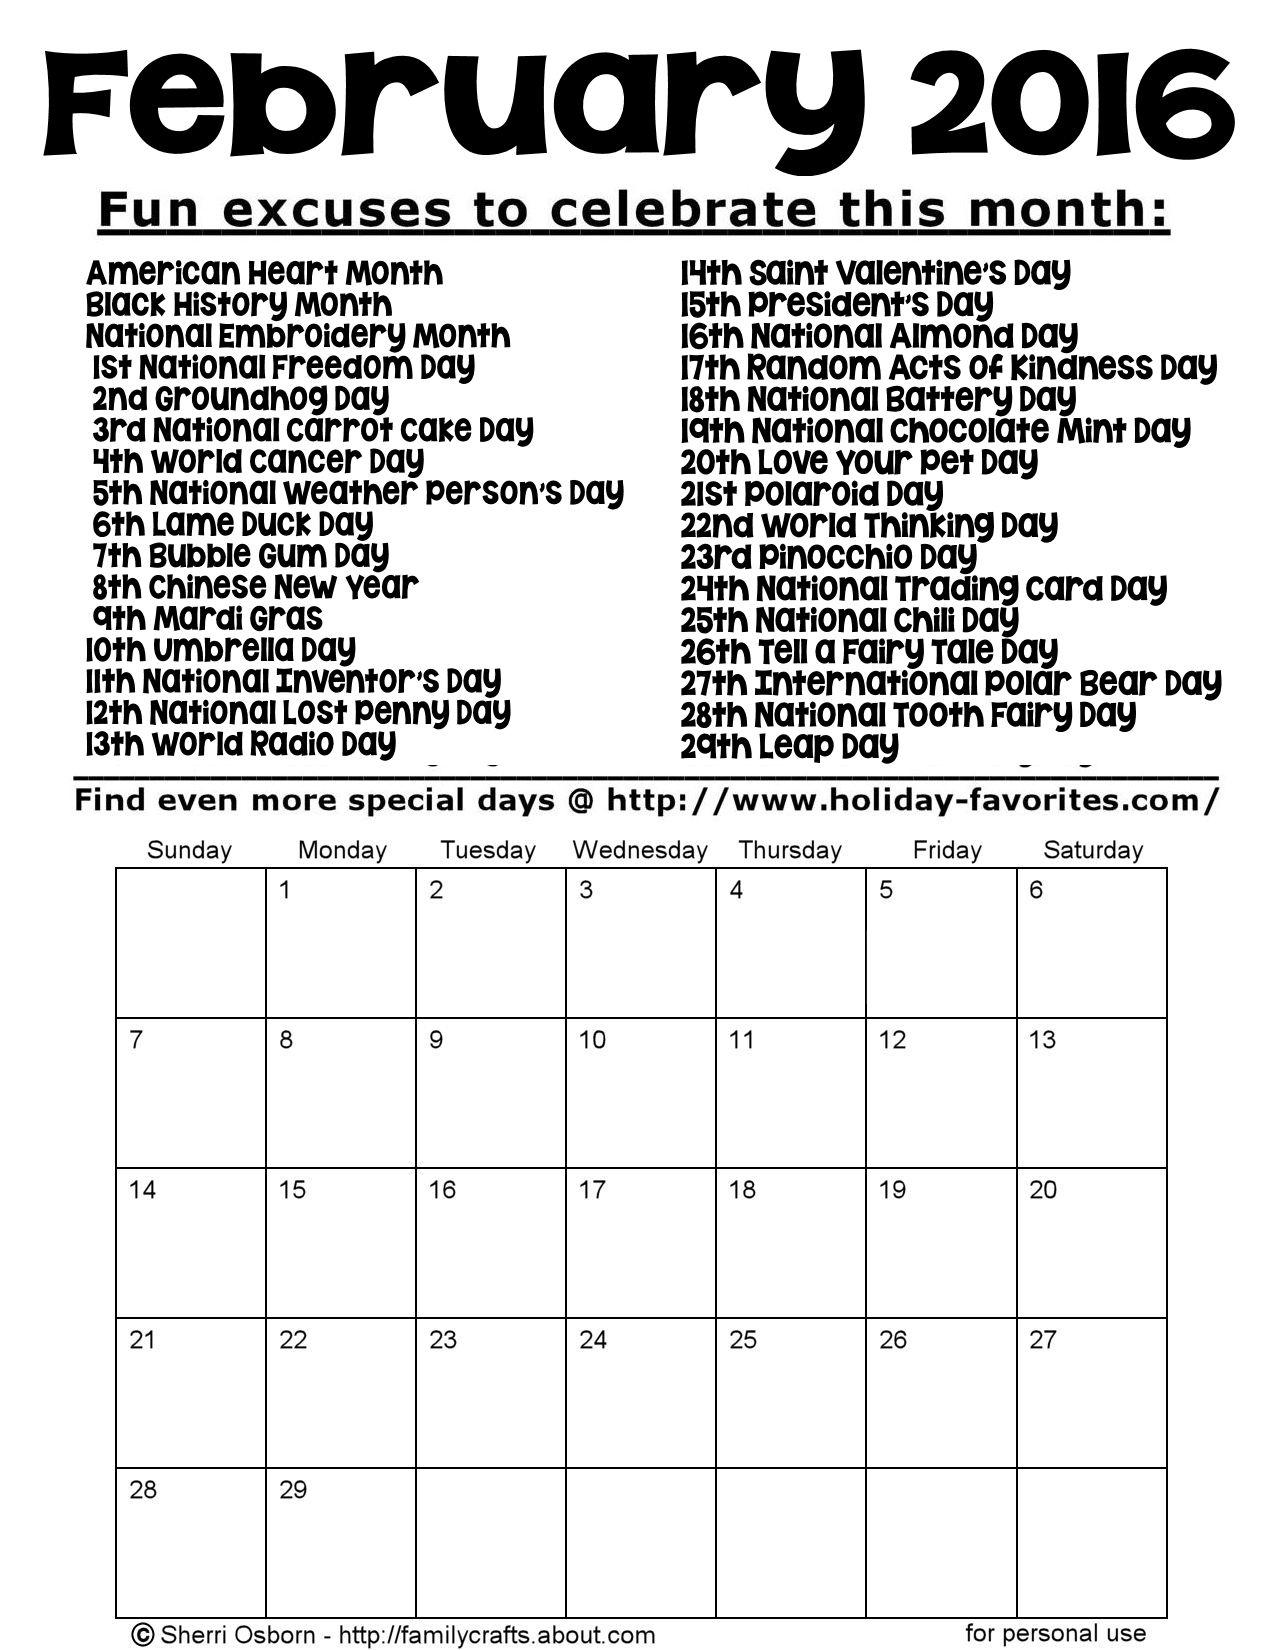 Get Calendar With All Special Days